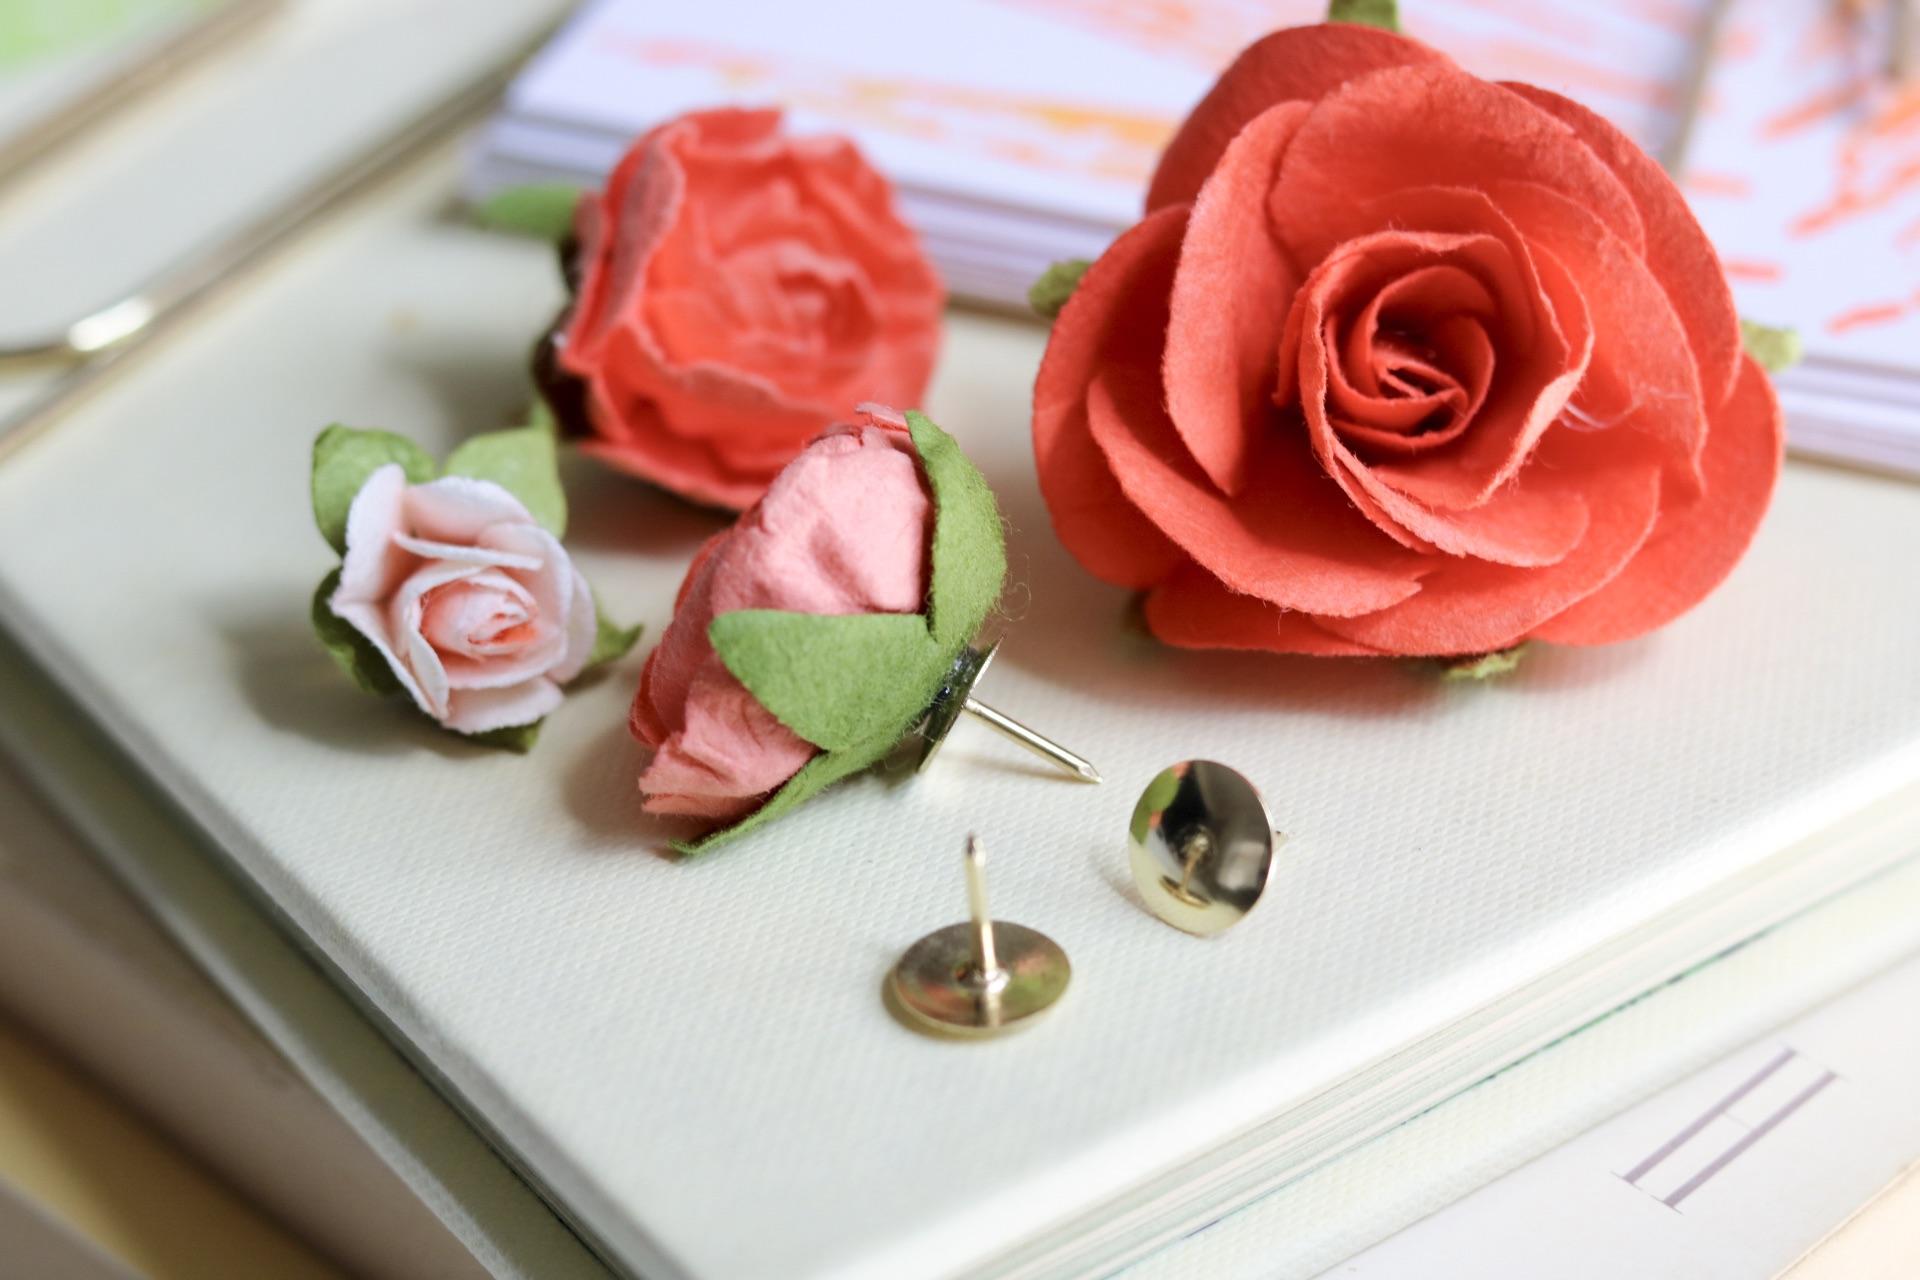 Handmade Gifts for Mother's Day Floral Thumb Tacks #mothersday #mothersdaygift #handmadegifts #giftsforher #giftsformom #diystationery #handstamped #stamp #leafstamp #nature #garden #corkboard #floarlthumbtacks #officediy #organization